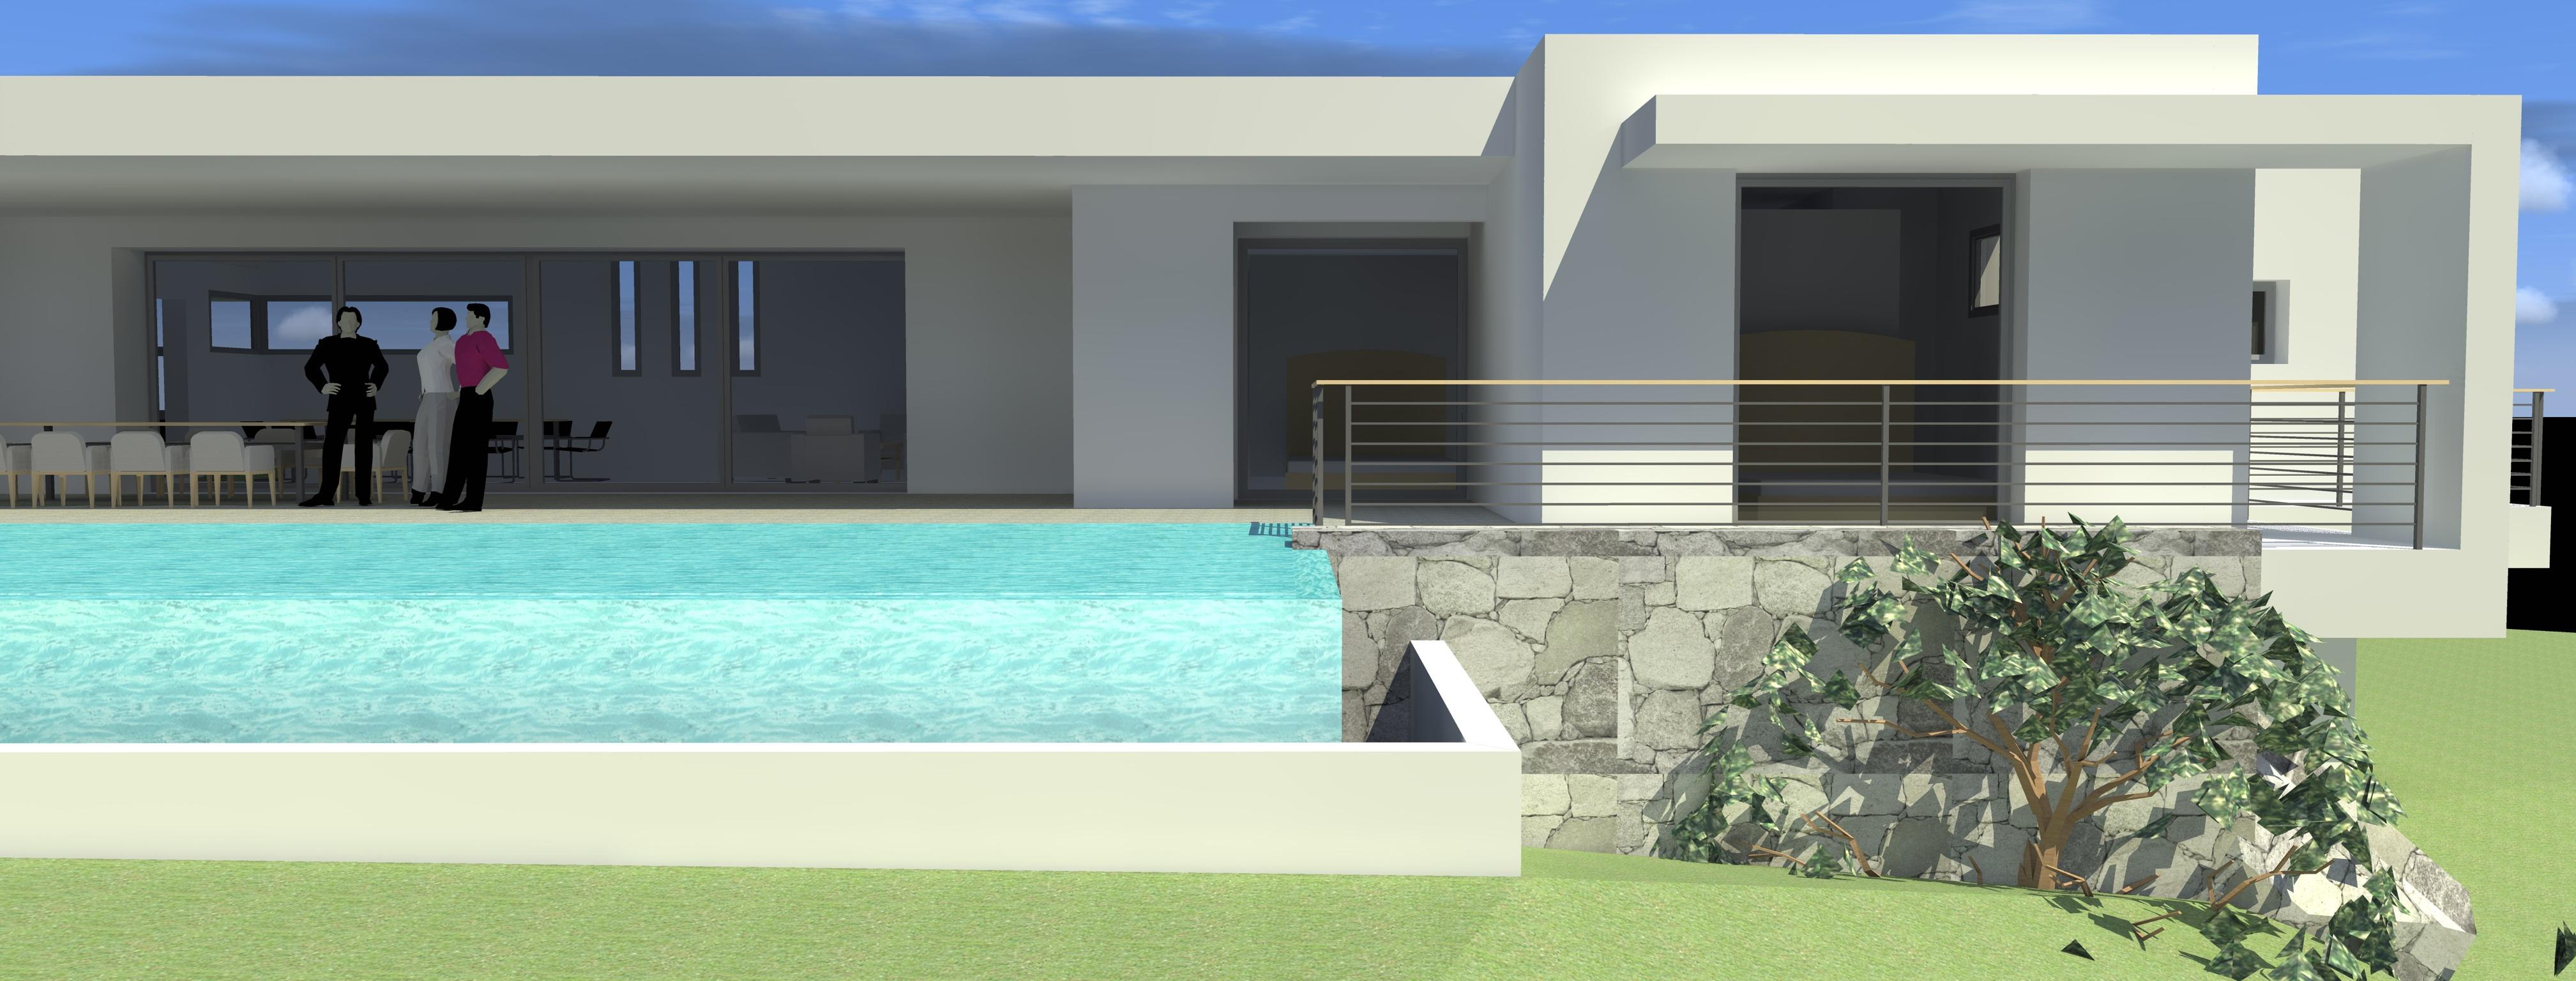 Villa rg villa contemporaine de luxe corse du sud Villas contemporaines de luxe